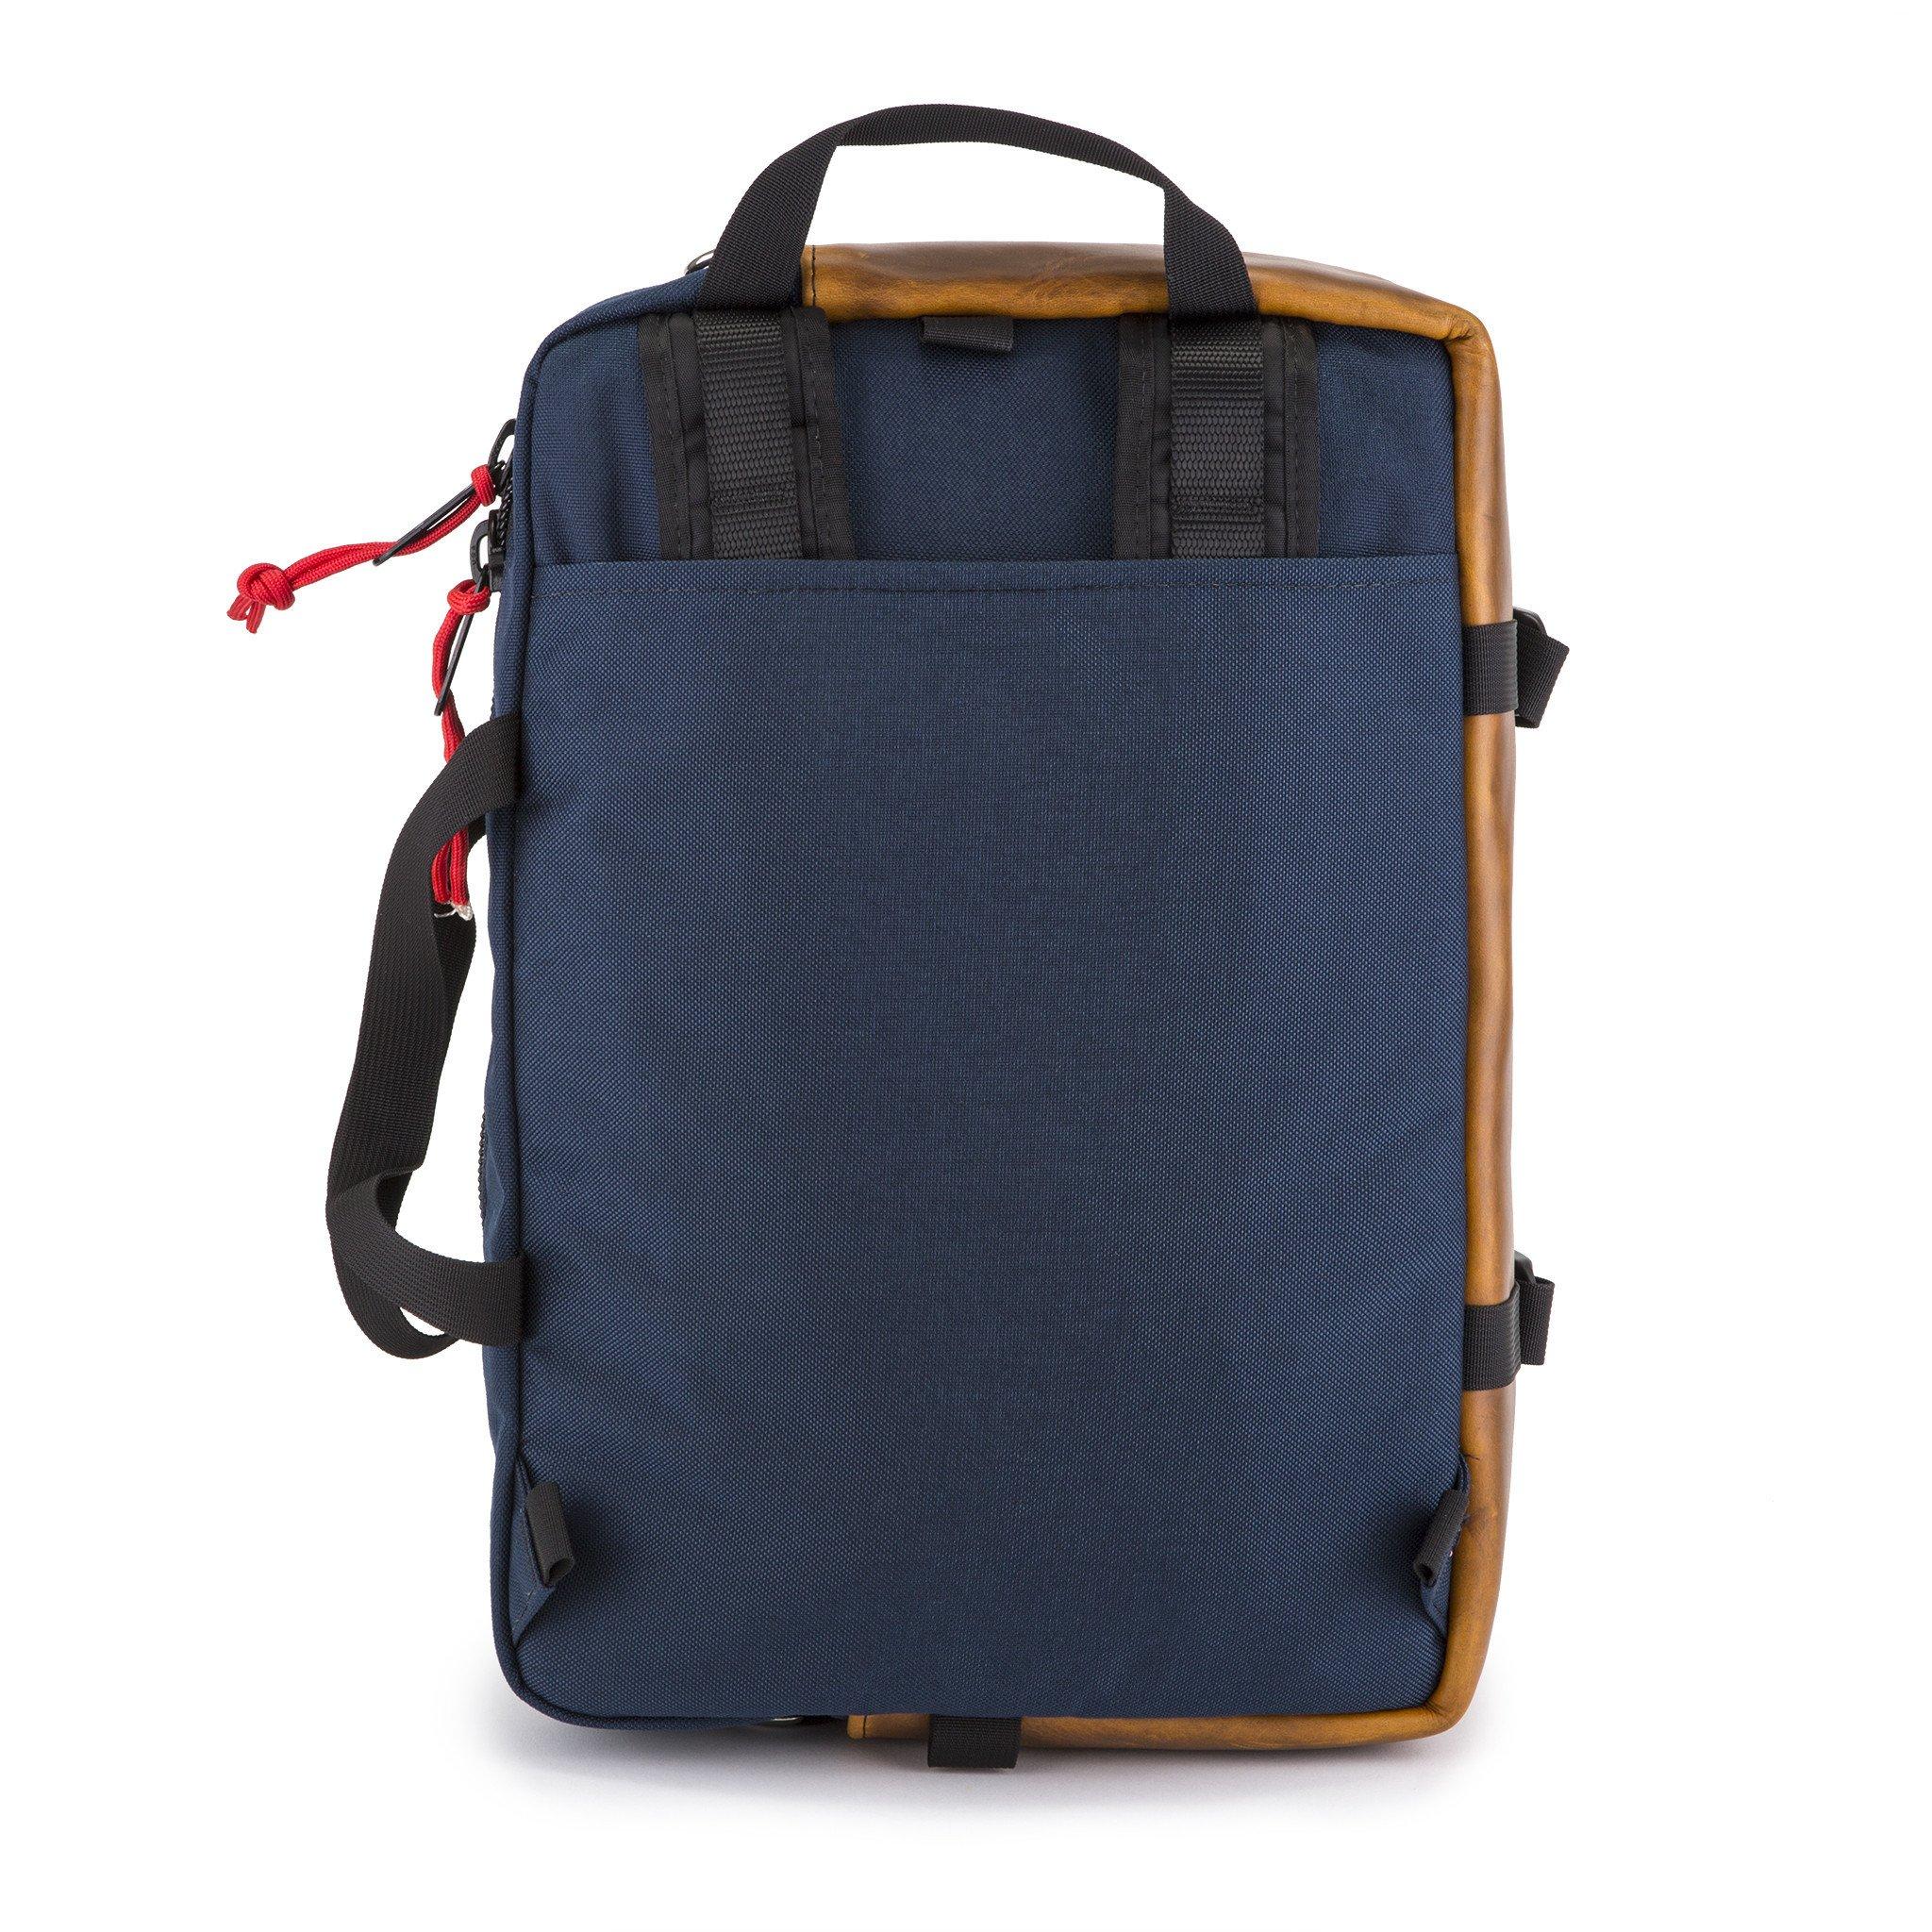 bags-mountain-briefcase-9_2048x2048.jpg